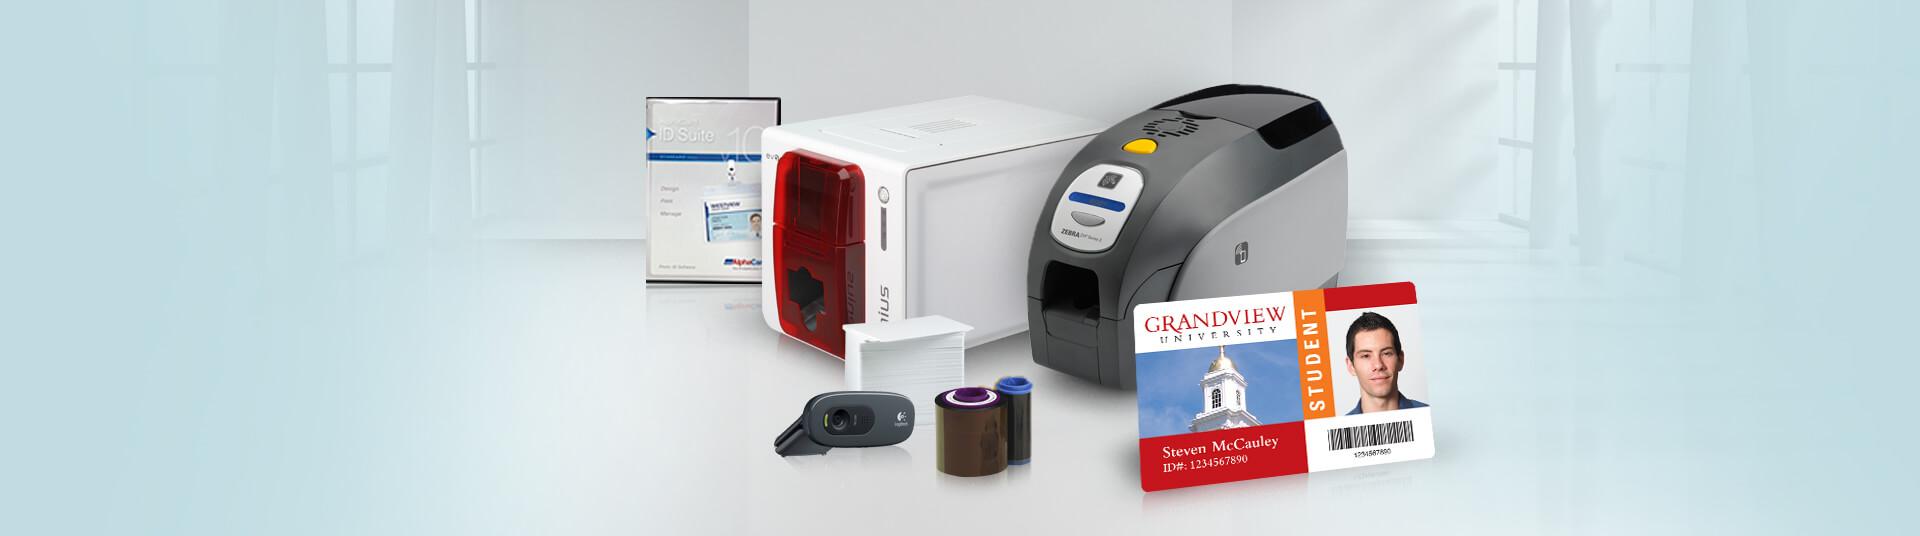 ID Card Technology